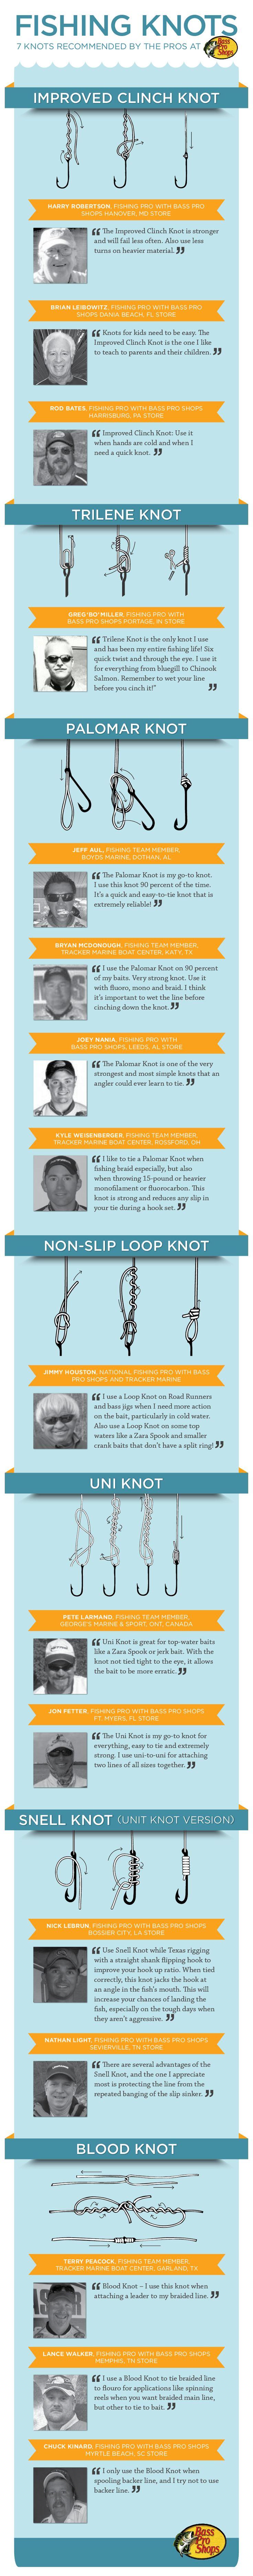 Fishing Knots Updated 5 14